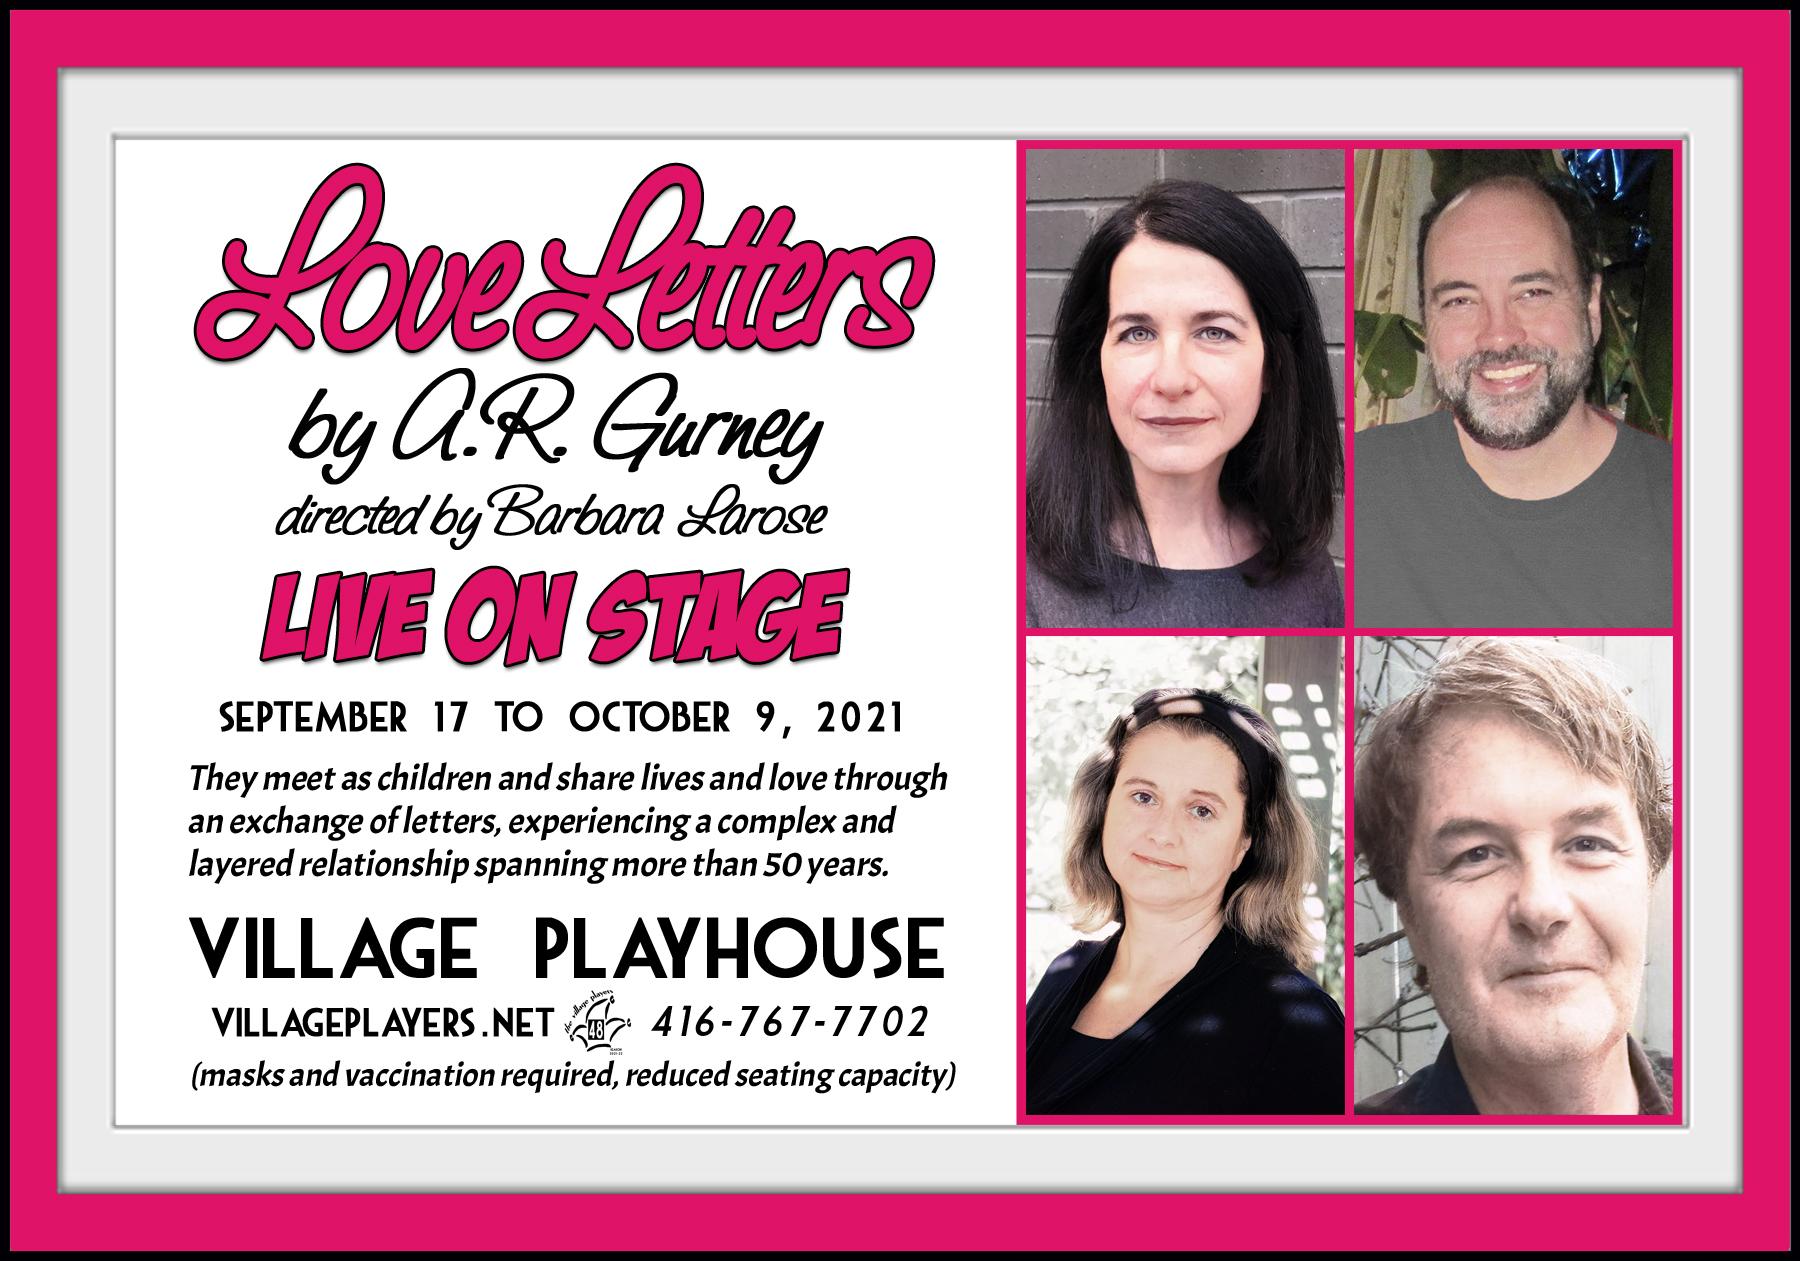 """Village Players"" ""Bloor West Village Players"" ""Village Playhouse"" ""Runnymede theatre"" theatre theater ""community theatre"" ""Love Letters"" ""AR Gurney"" ""live on stage"" ""Deena Baltman"" ""David Borwick"" ""Brenda Massey-Beauregard"" ""Rob Candy"""